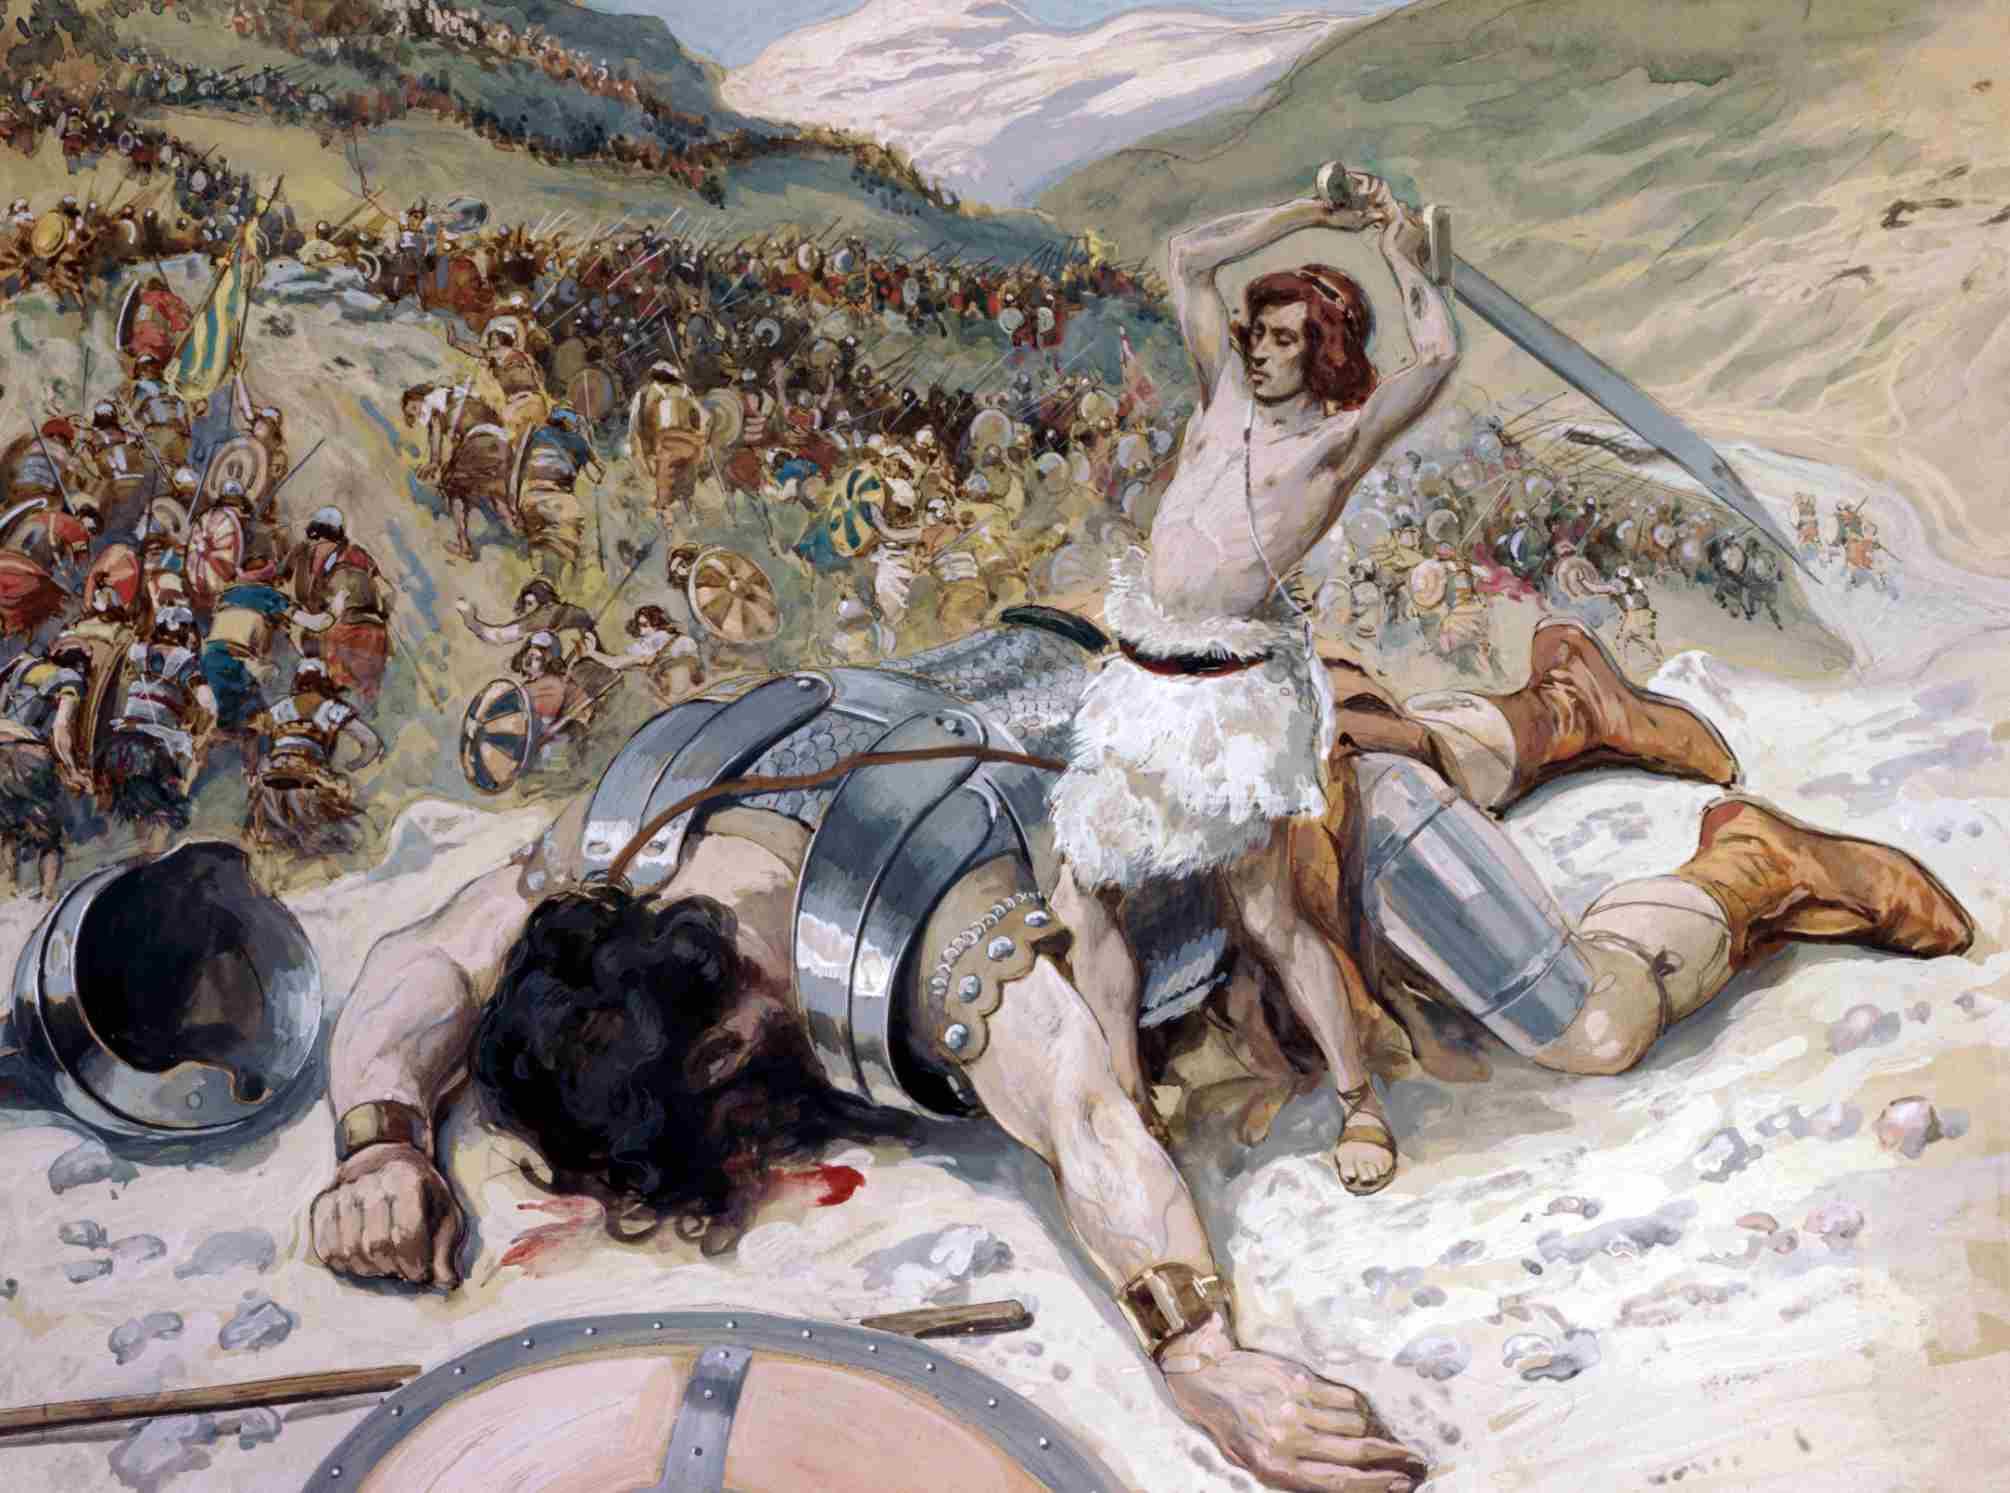 An illustration of David conquering Goliath.